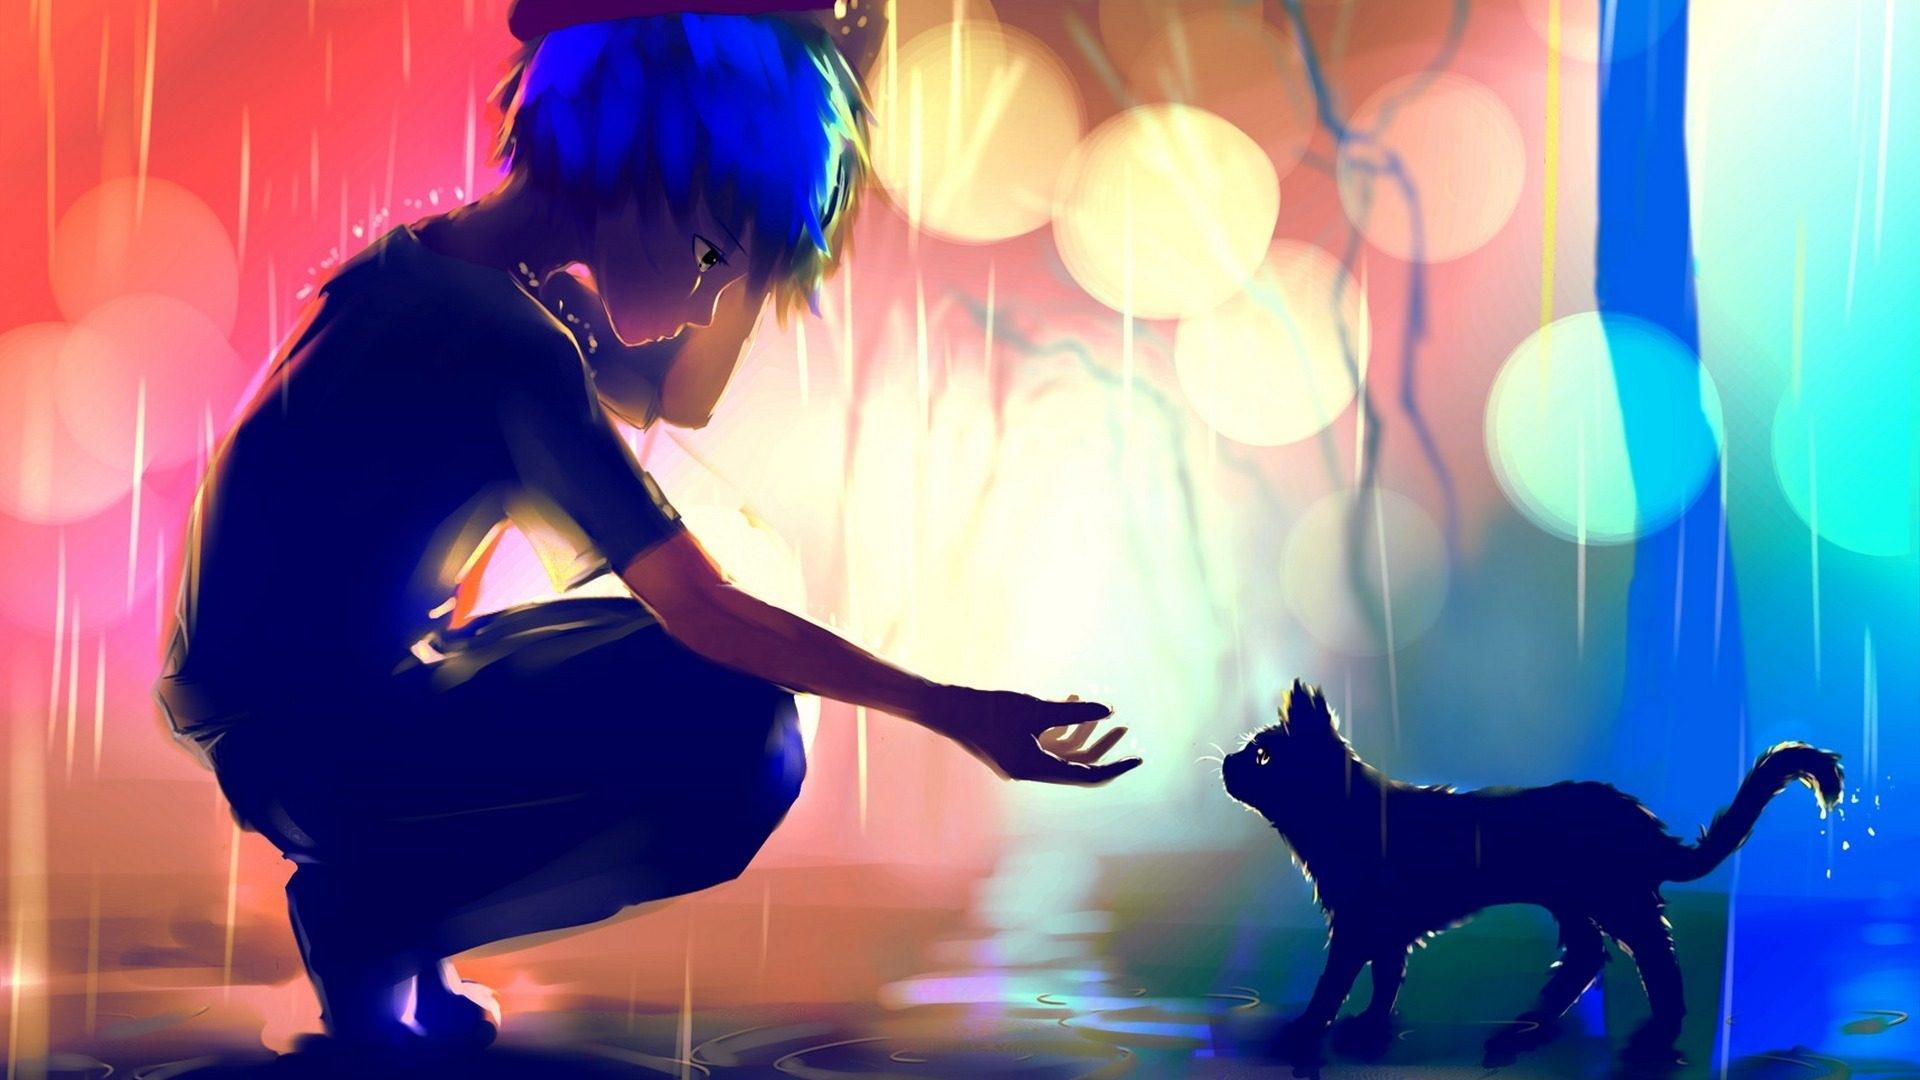 Blue Hair Boy Cat Glow Original Anime Rain 1920x1080